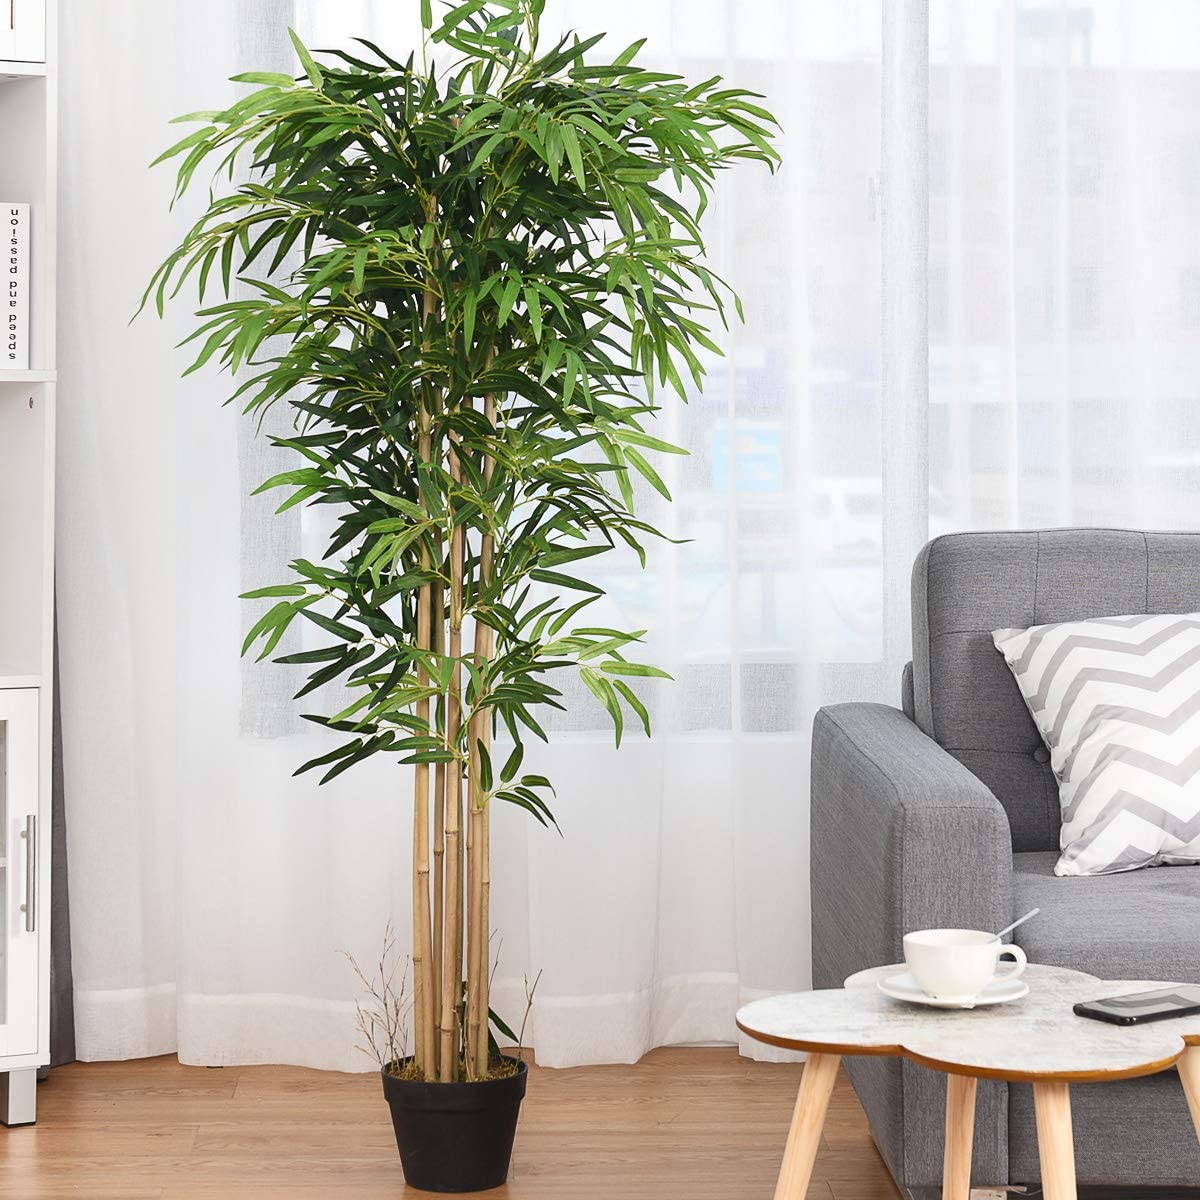 BestComfort Max 42% Outstanding OFF 5 Feet Artificial Bamboo Tree Indoo Decorative Silk